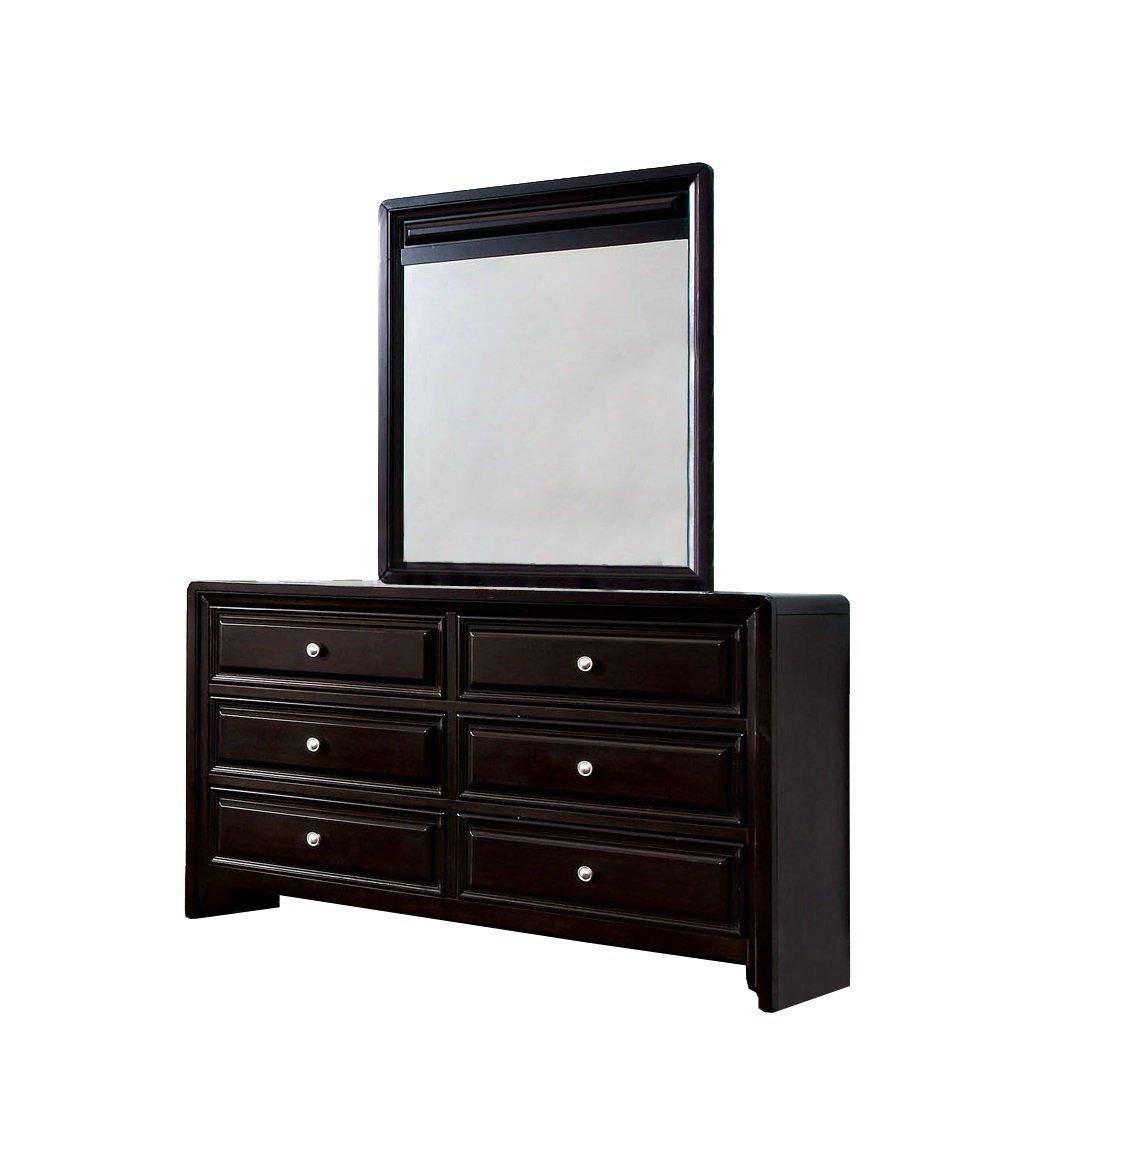 Amazon Com Furniture Of America Melbourne 6 Drawer Dresser And Mirror Set Espresso Finish Kitchen Dining